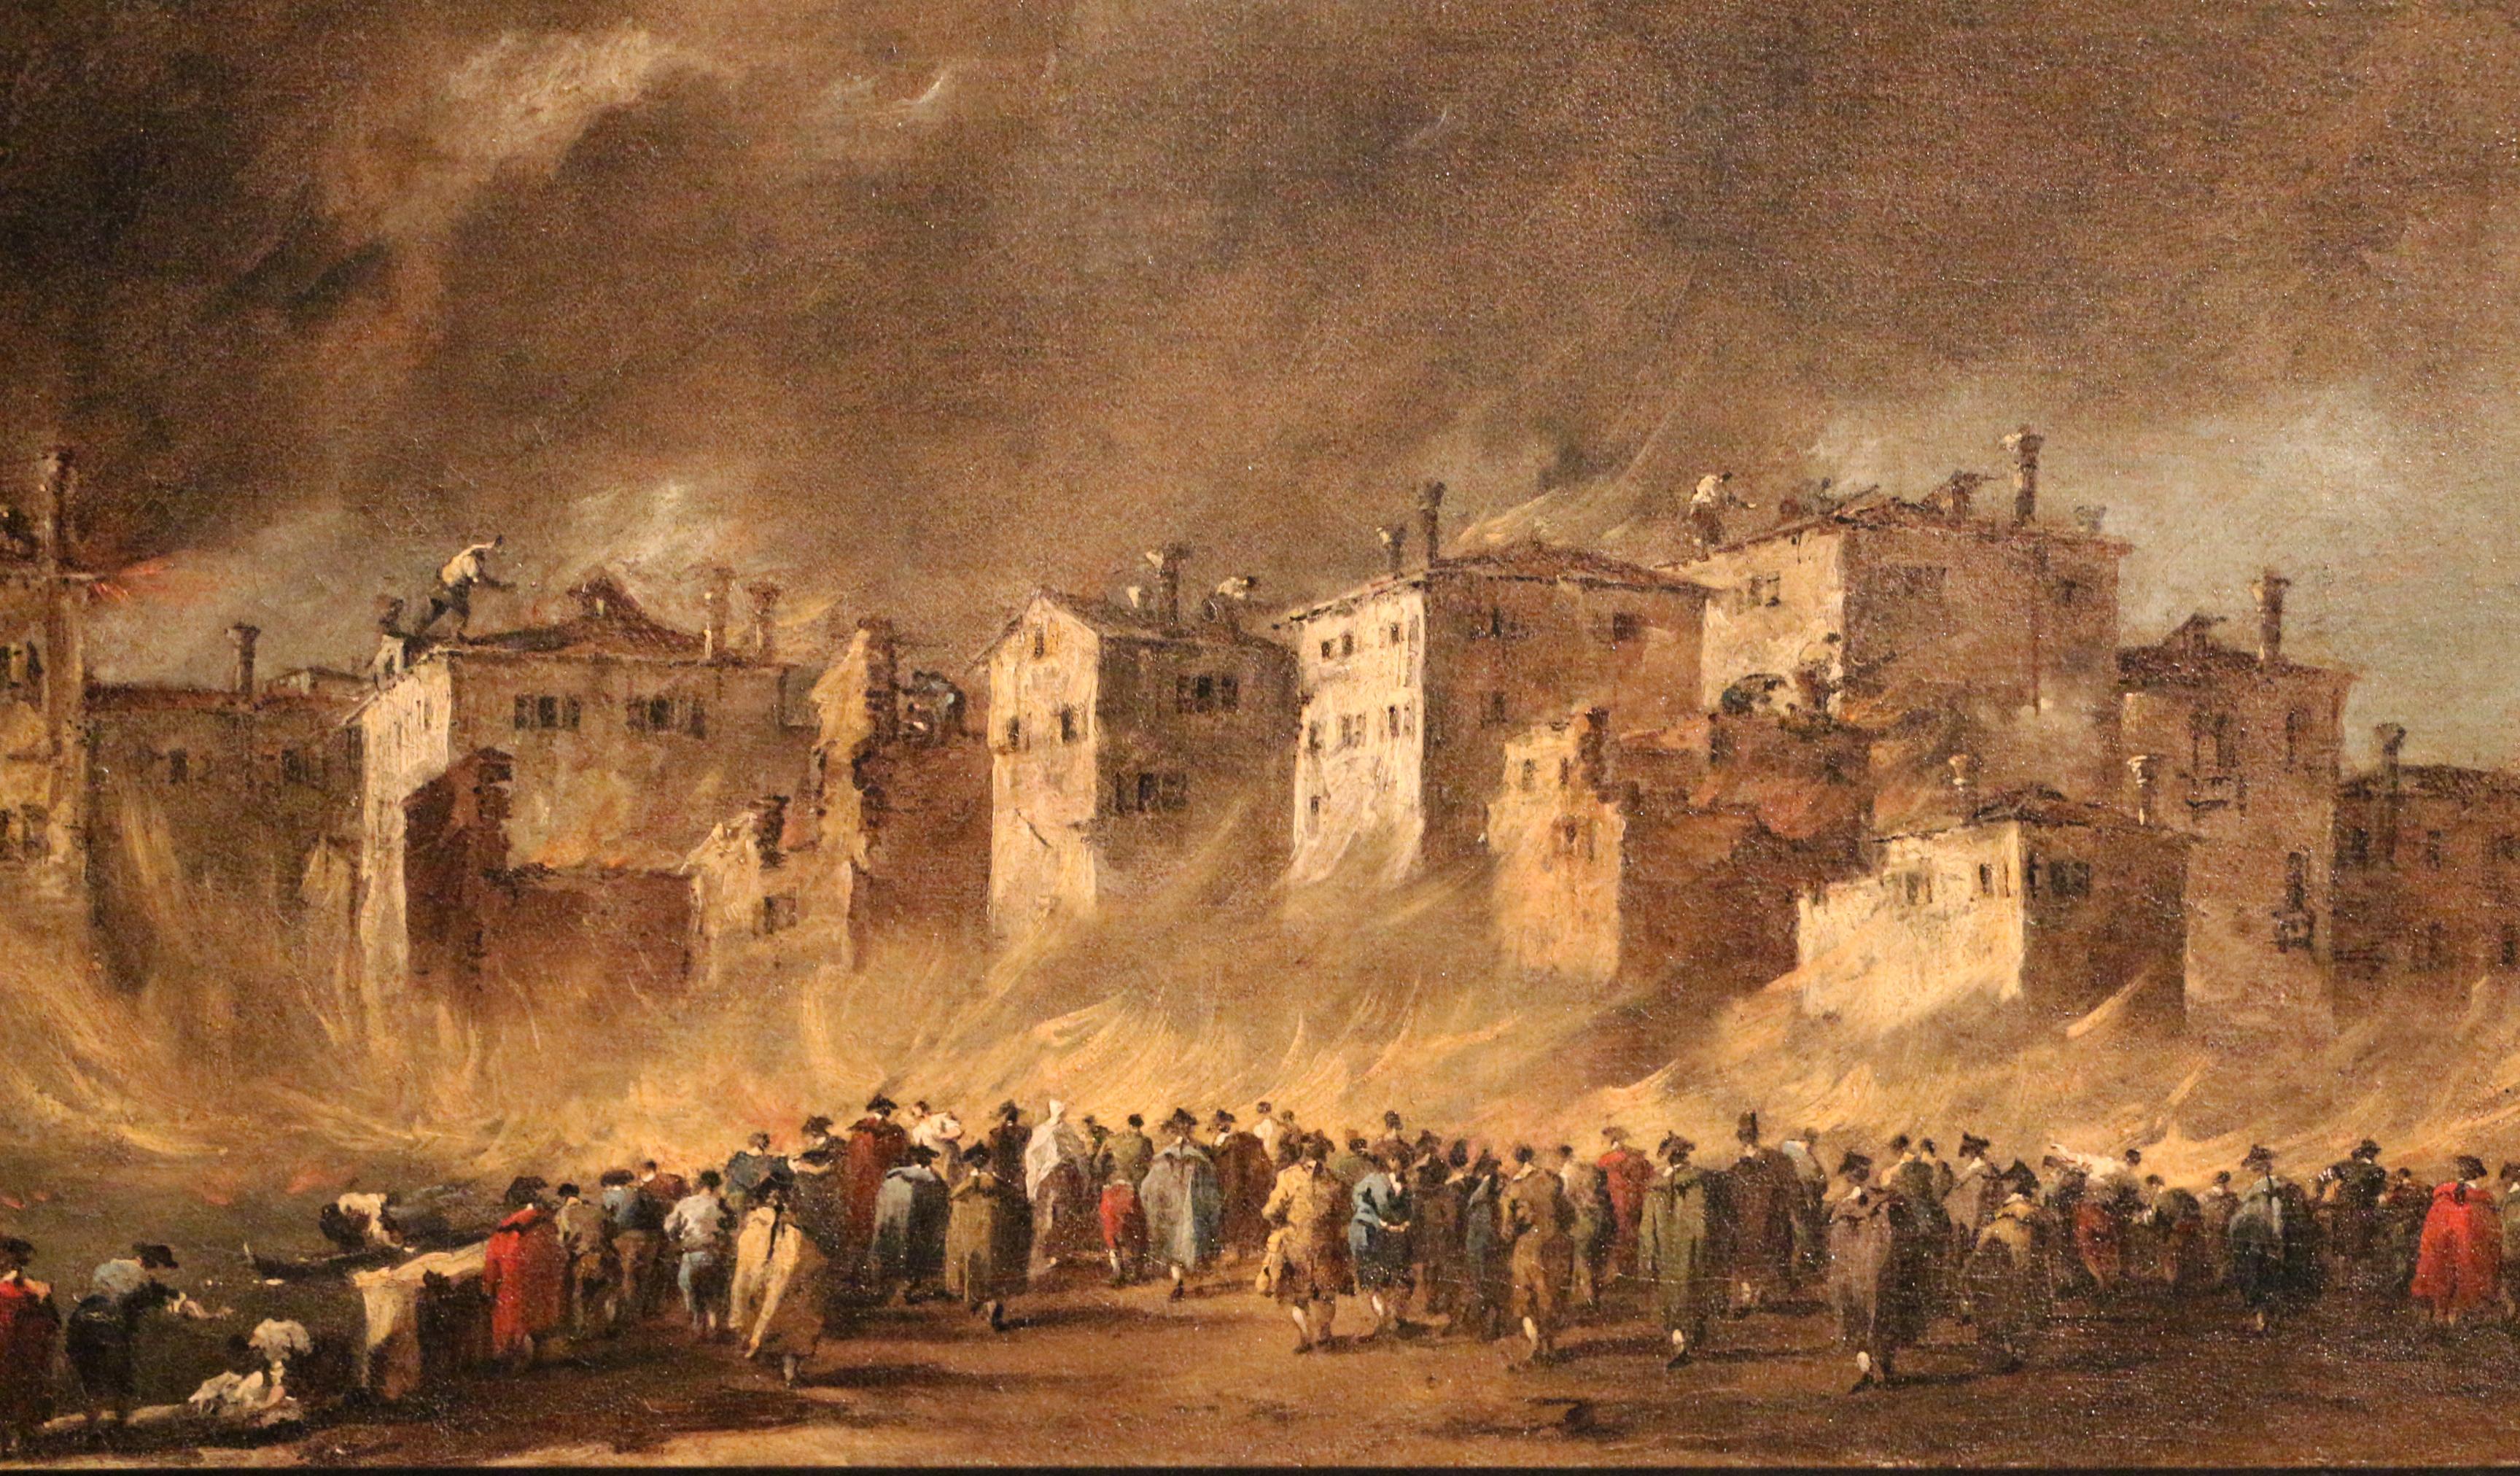 File:Francesco guardi, incendio dei depositi degli oli a san marcuola, 1789,